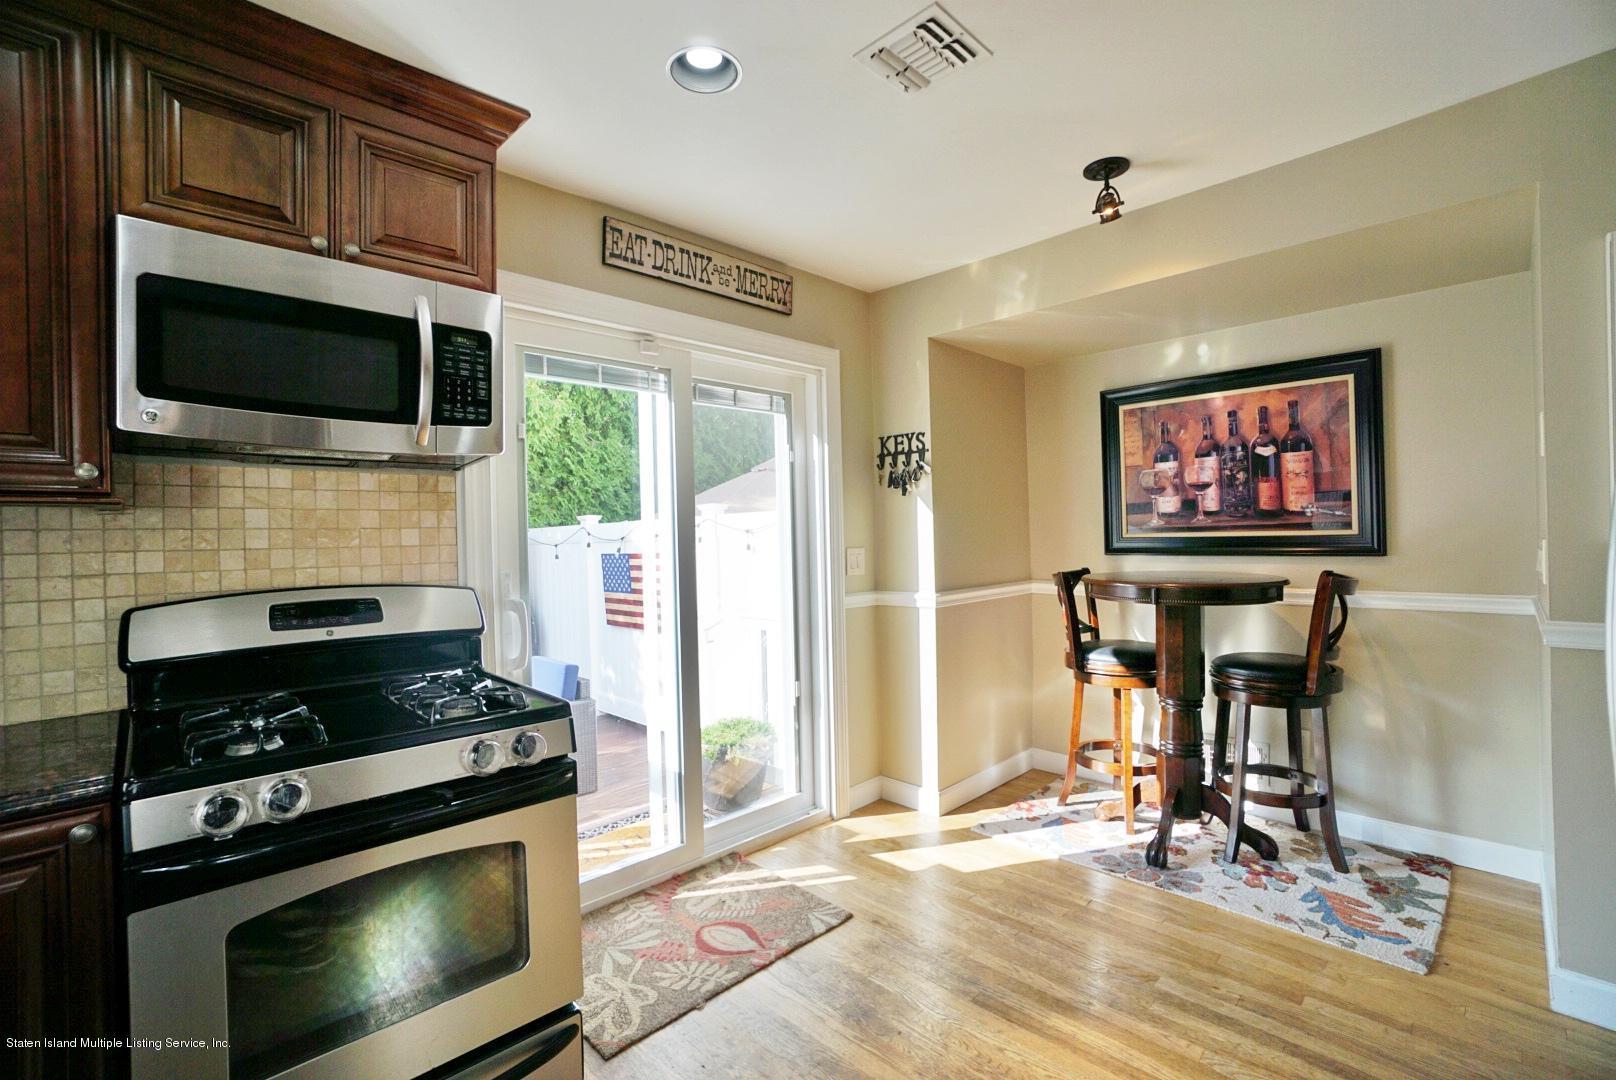 Single Family - Semi-Attached 66 Reading Avenue  Staten Island, NY 10312, MLS-1132256-8